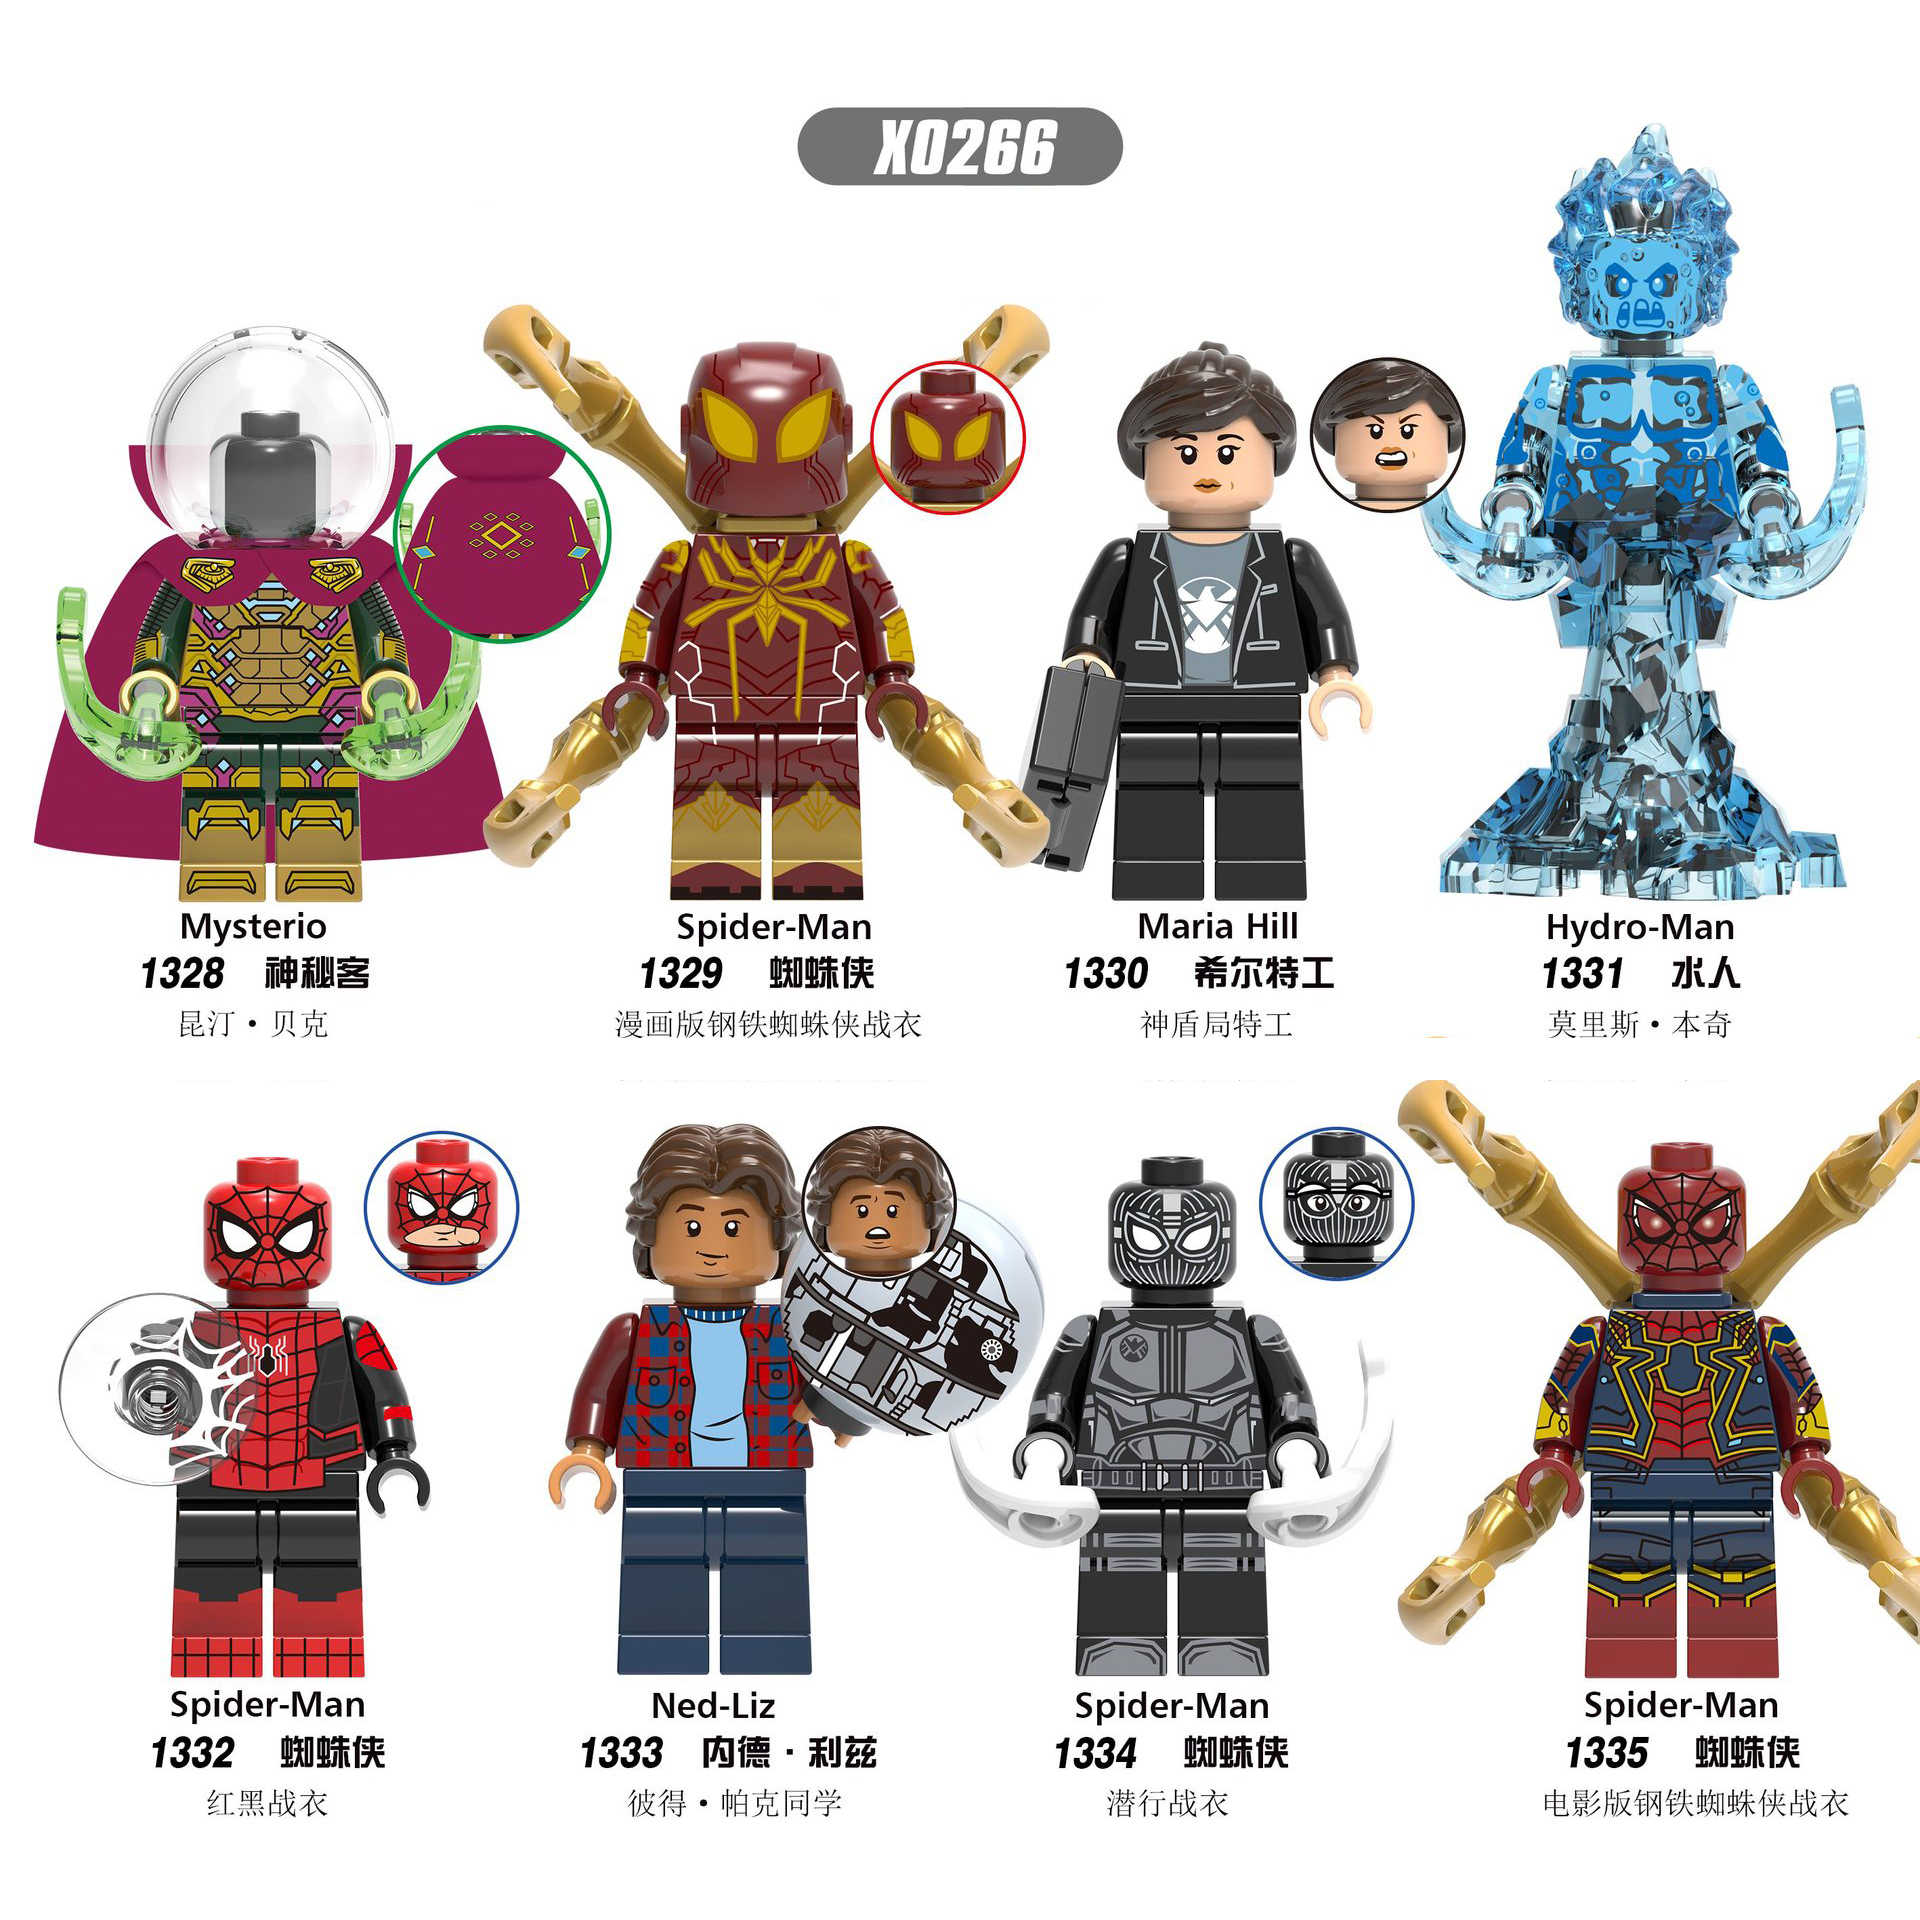 X0266 LegoING Marvel ant AvengersING Super héroe Spiderman misterio agua hombre agente construcción bloques juguete niño traje